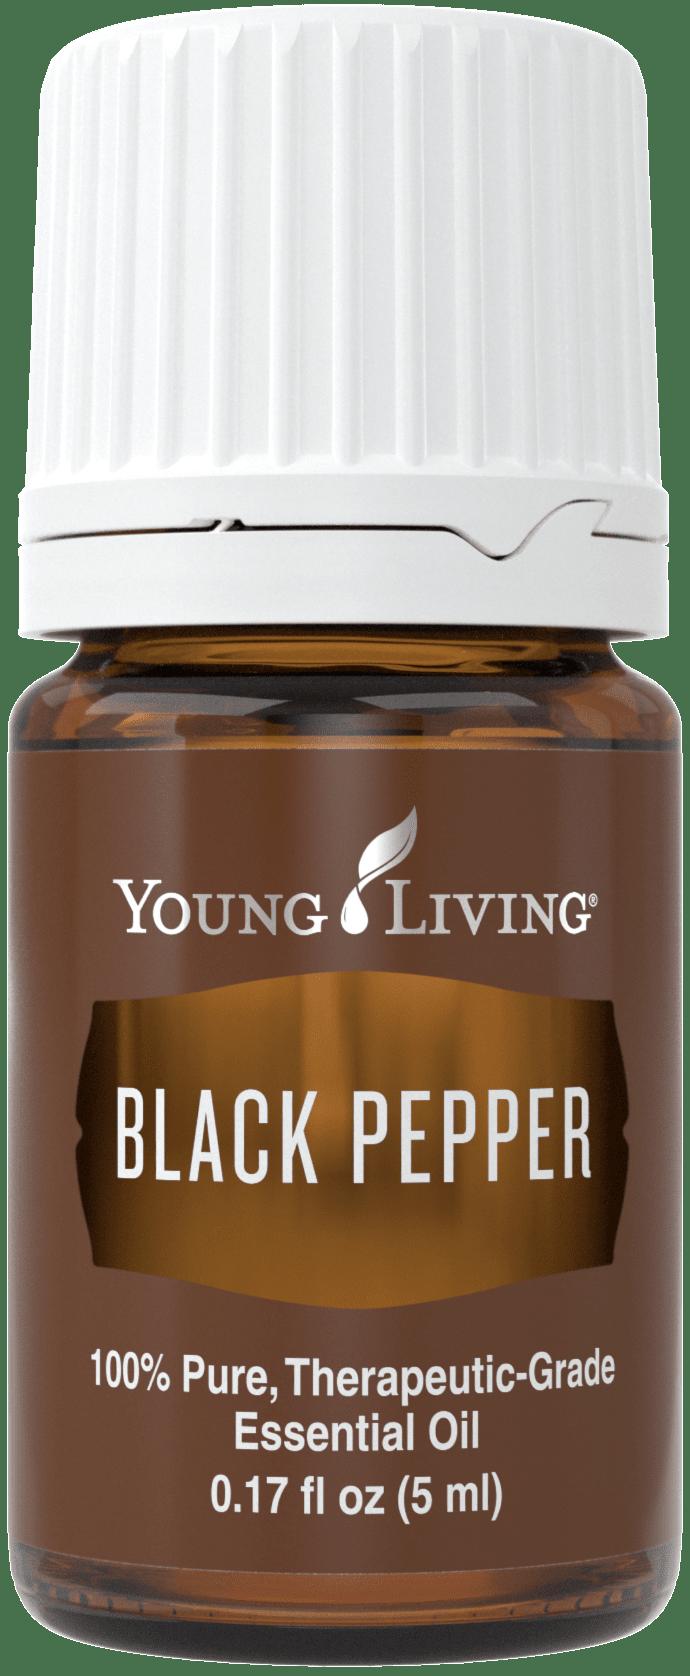 Ätherisches Öl Young Living: Black Pepper (Schwarzer Pfeffer) 5ml